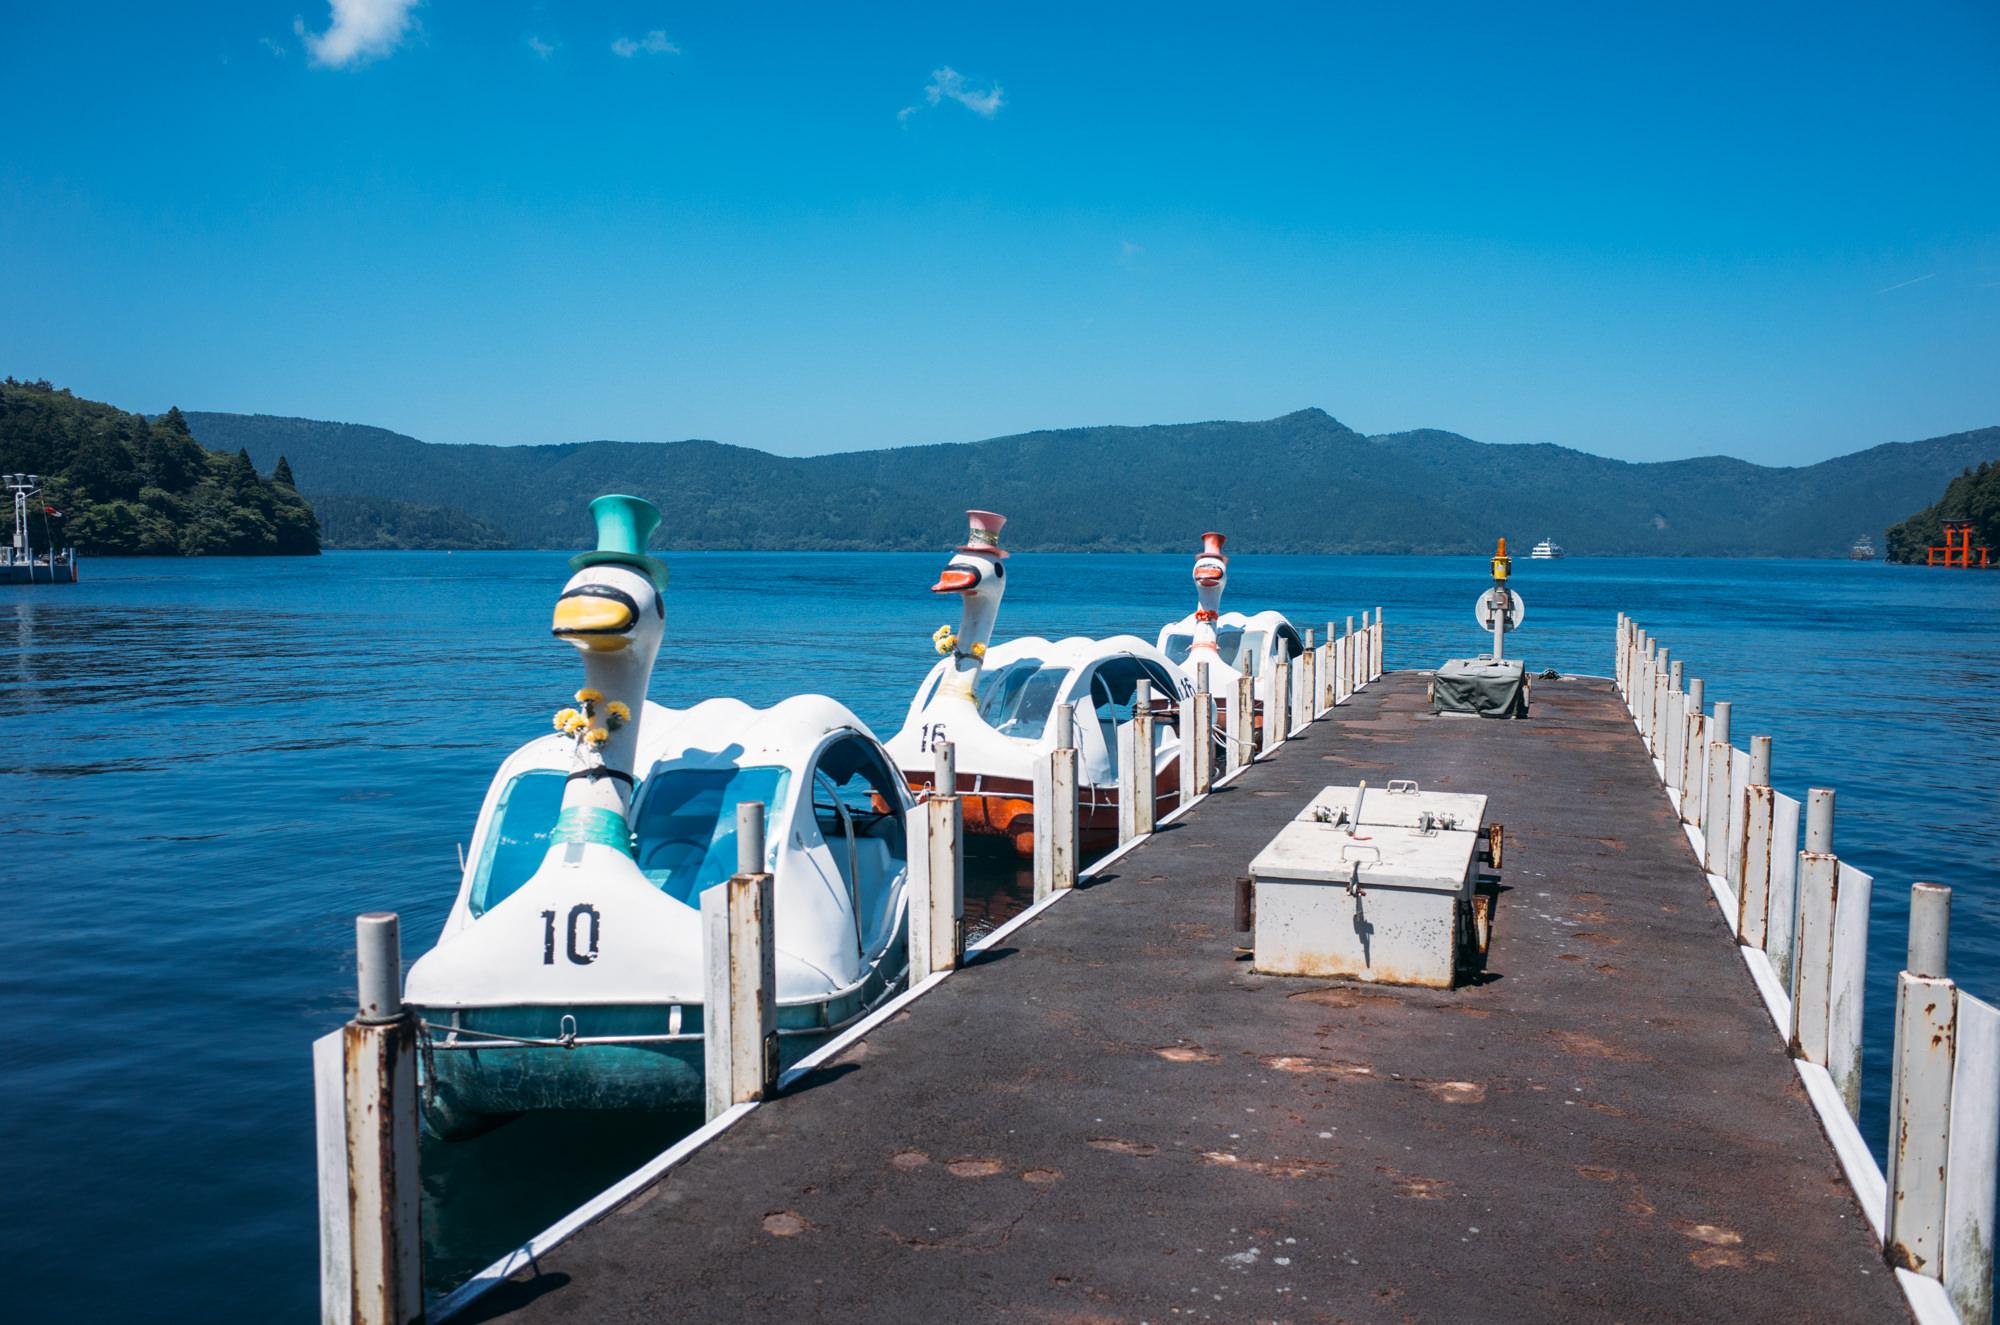 wrenee-hakone-japan-lake-ashi-swan-boats-16.jpg